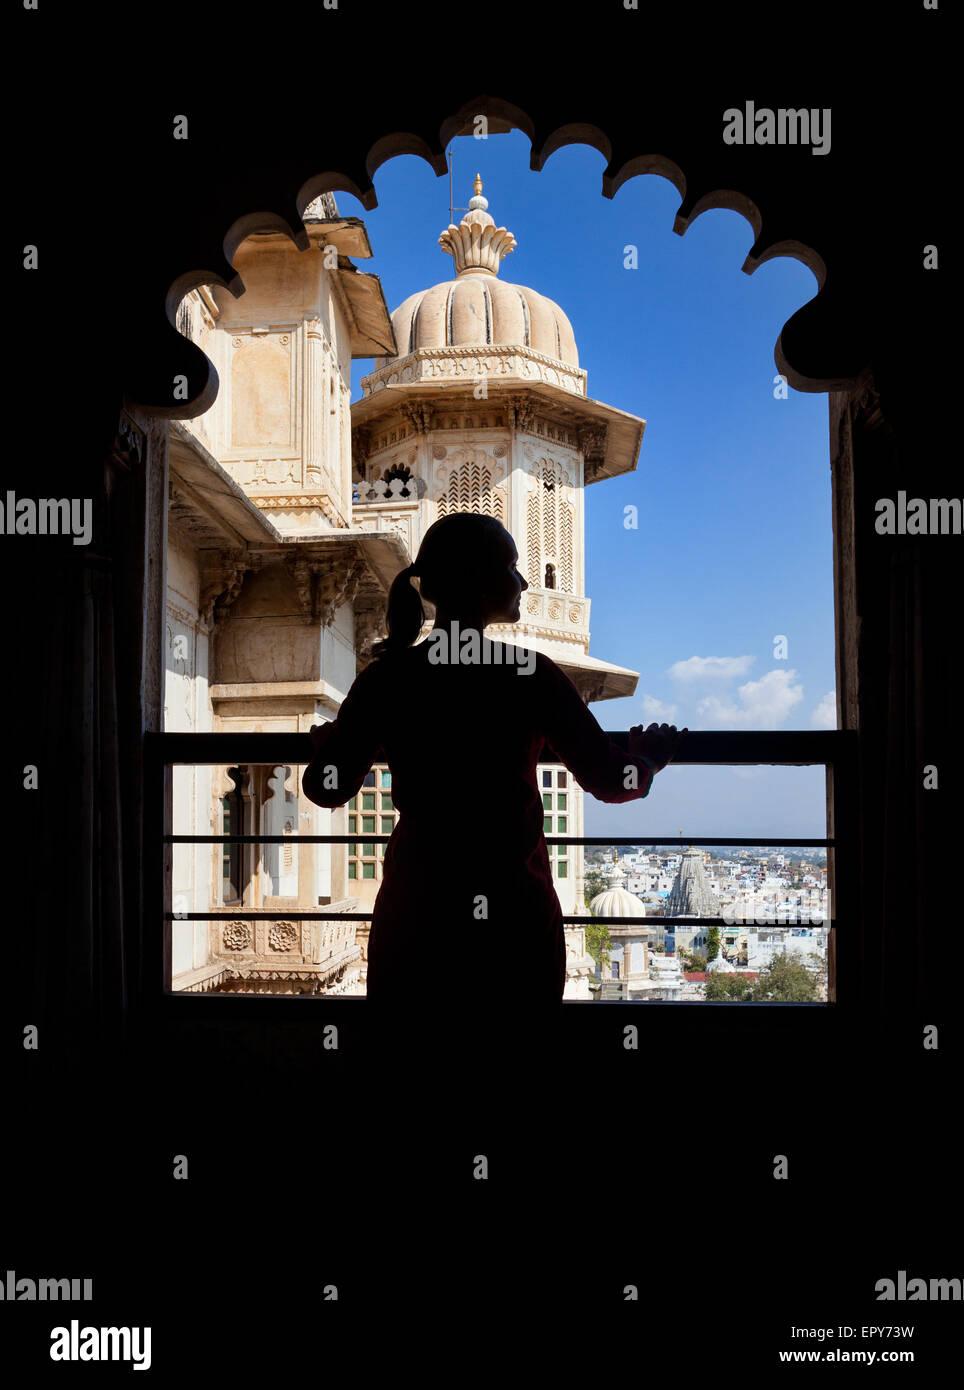 Silhouette di donna sul balcone in City Palace Museum di Udaipur, Rajasthan, India Immagini Stock